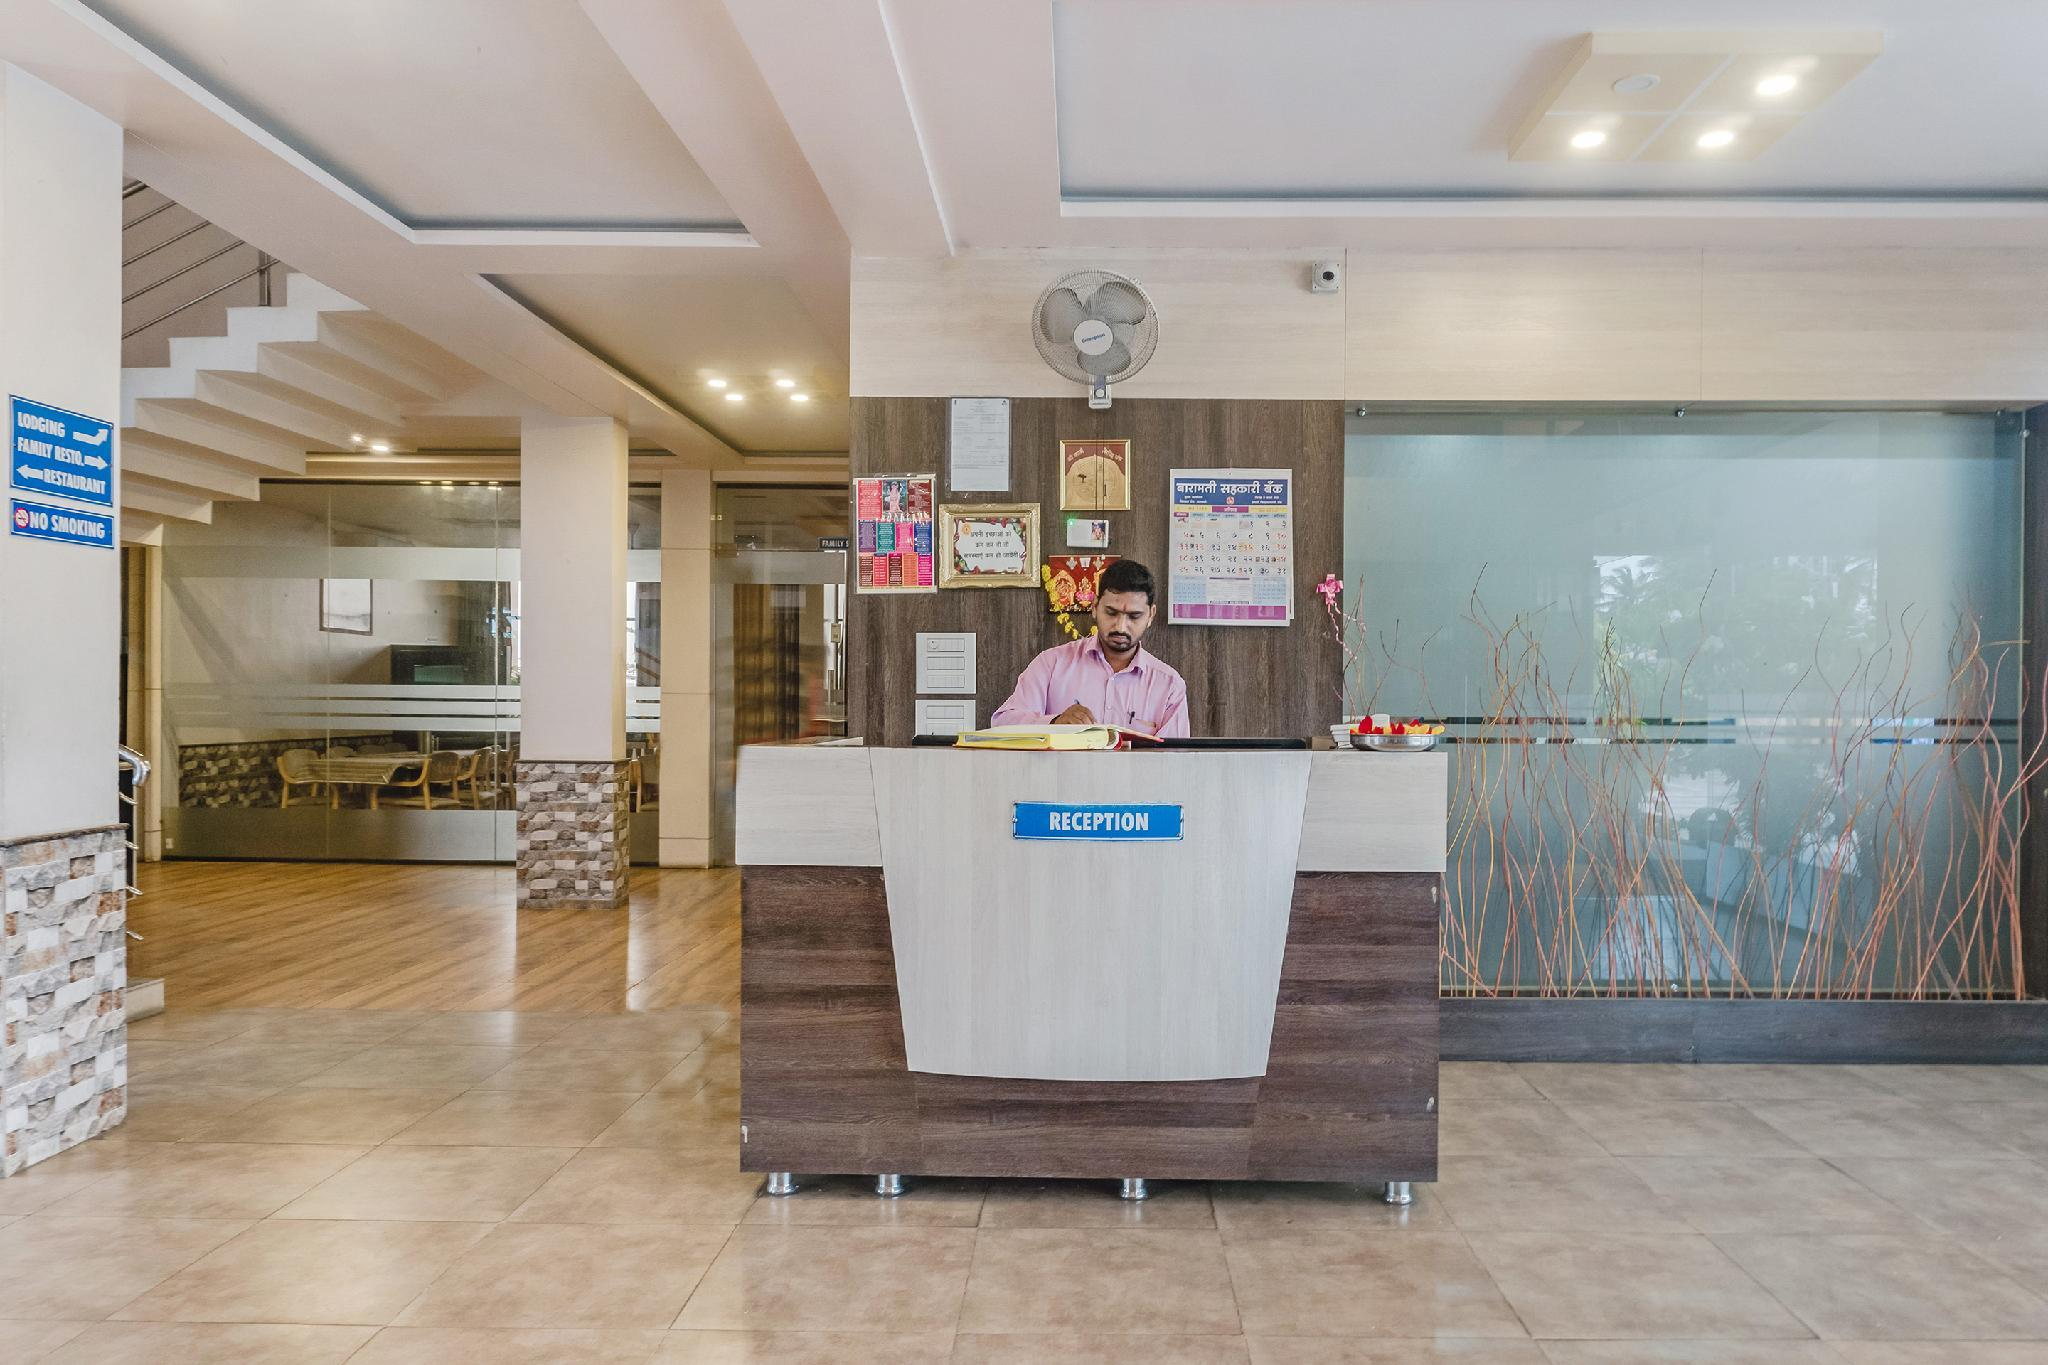 Capital O 47179 Hotel Swamiraj